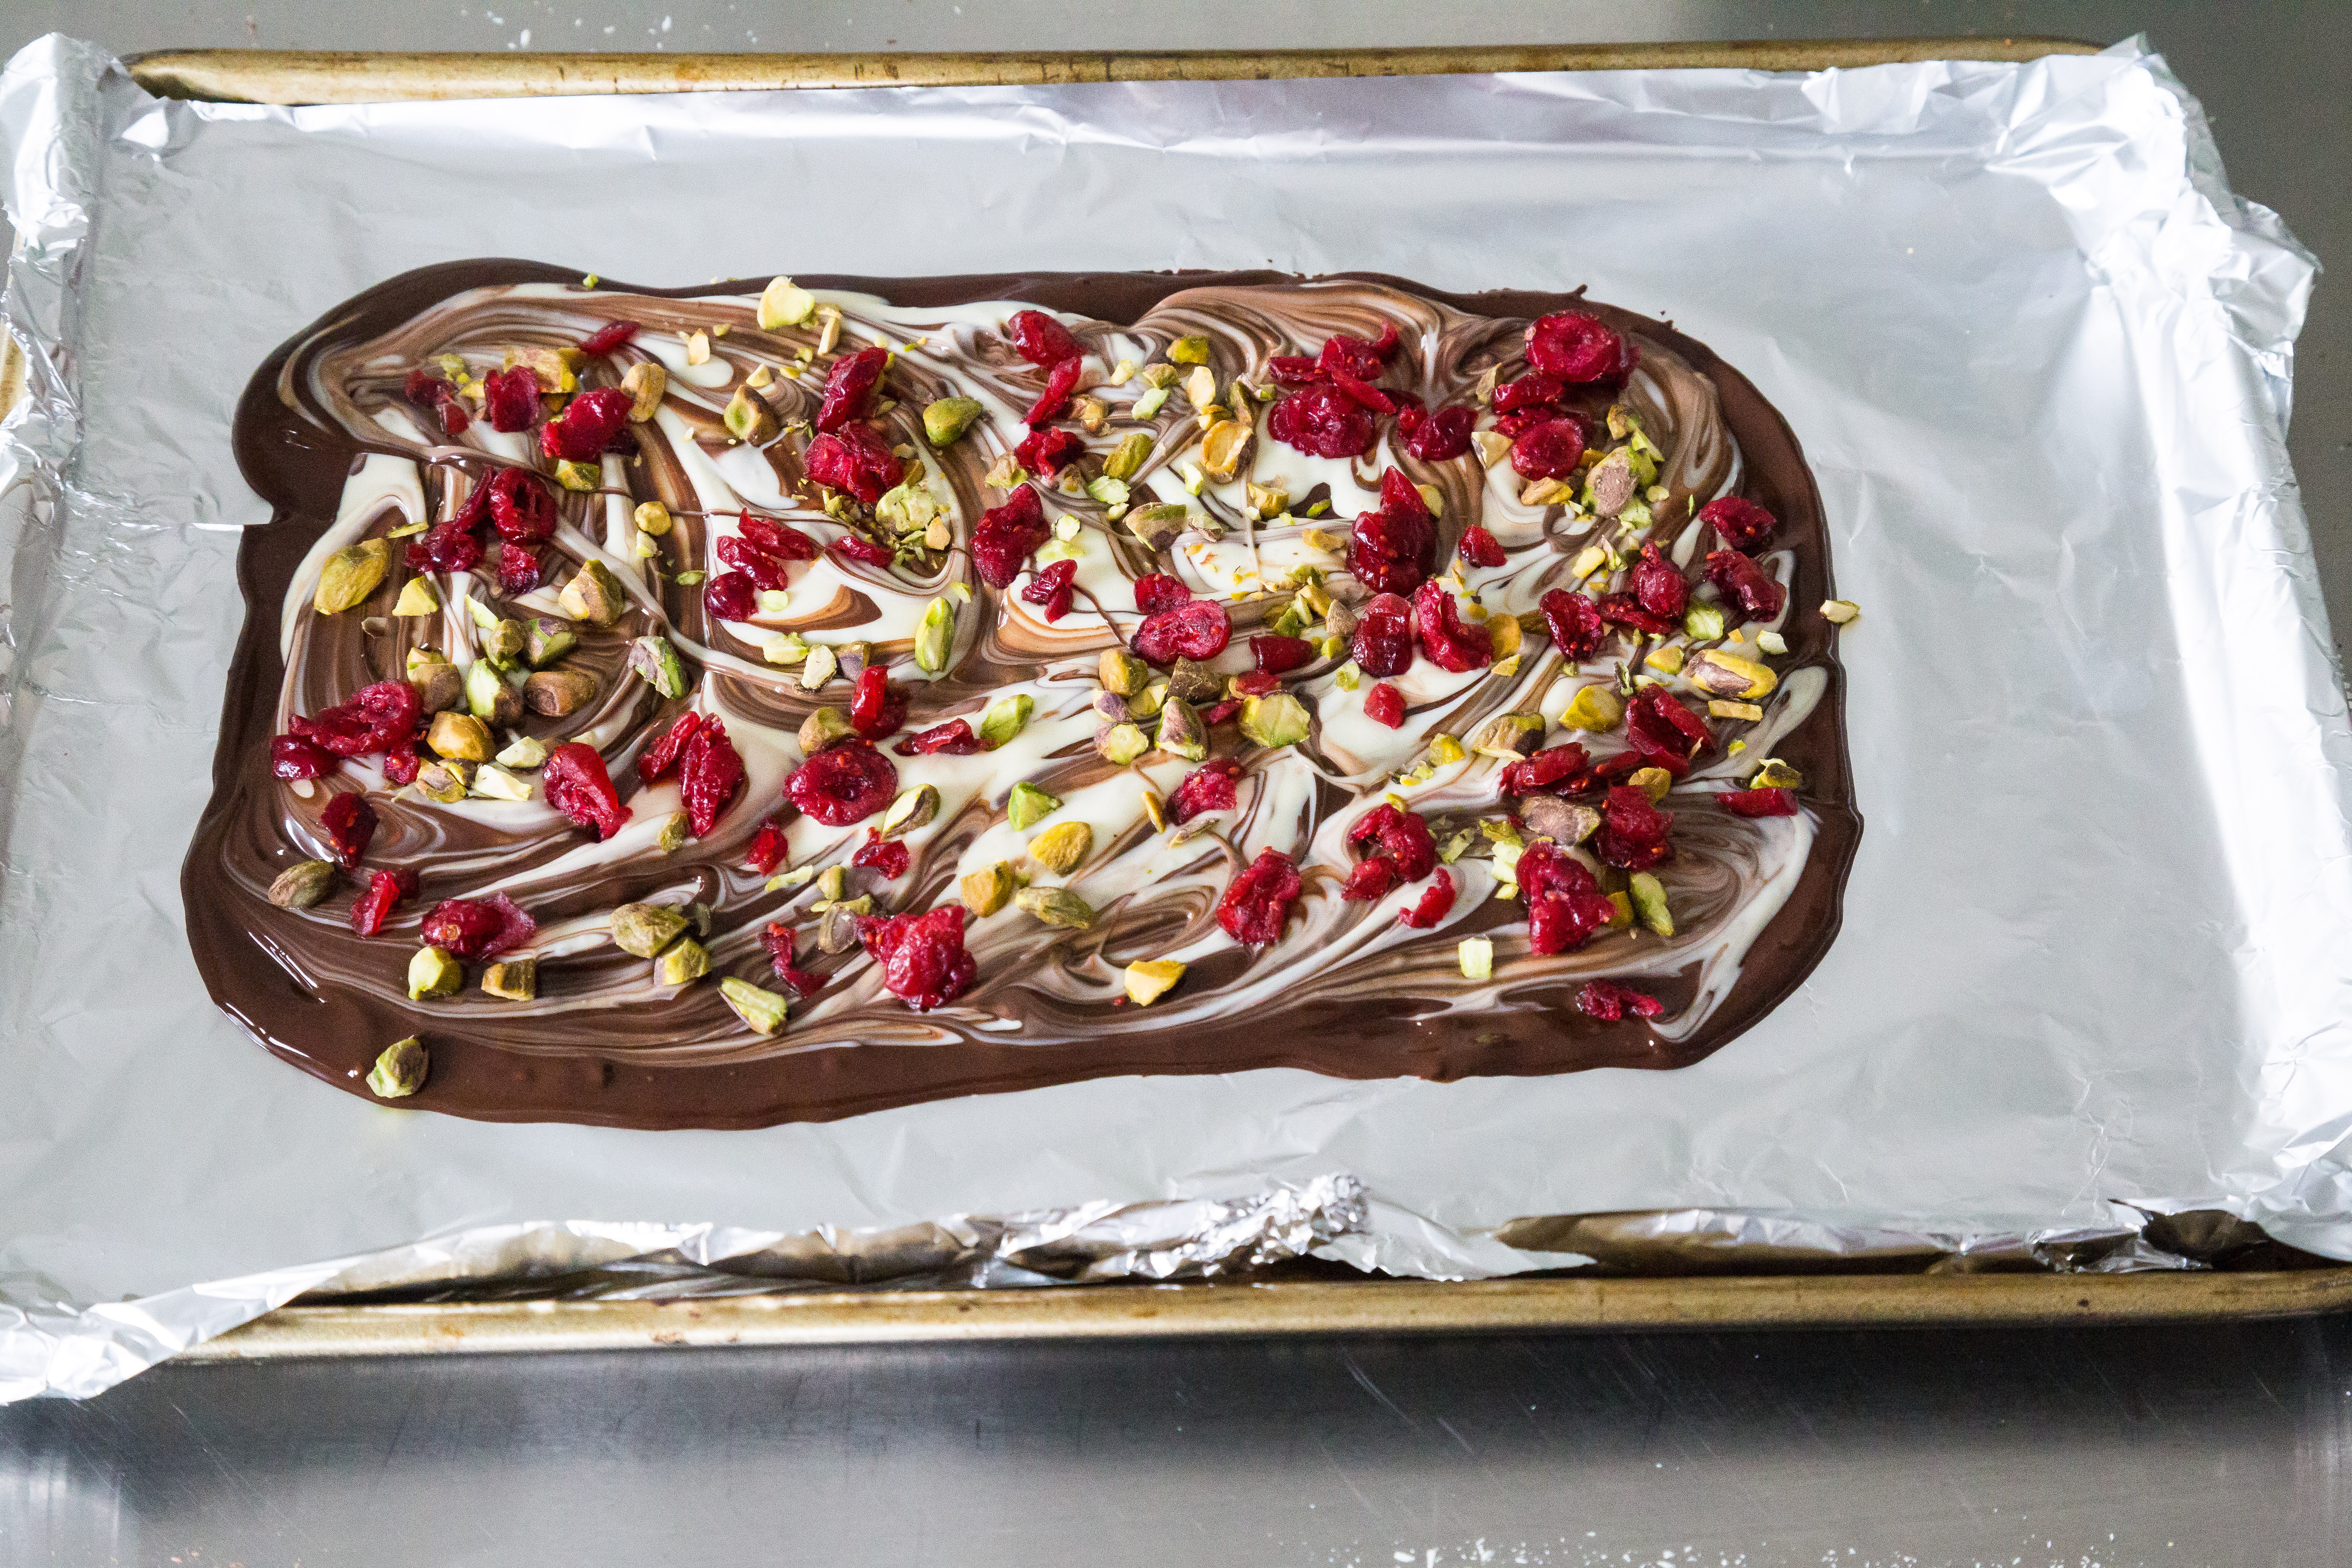 Cranberry pistachio chocolate bark | Eat Good 4 Life